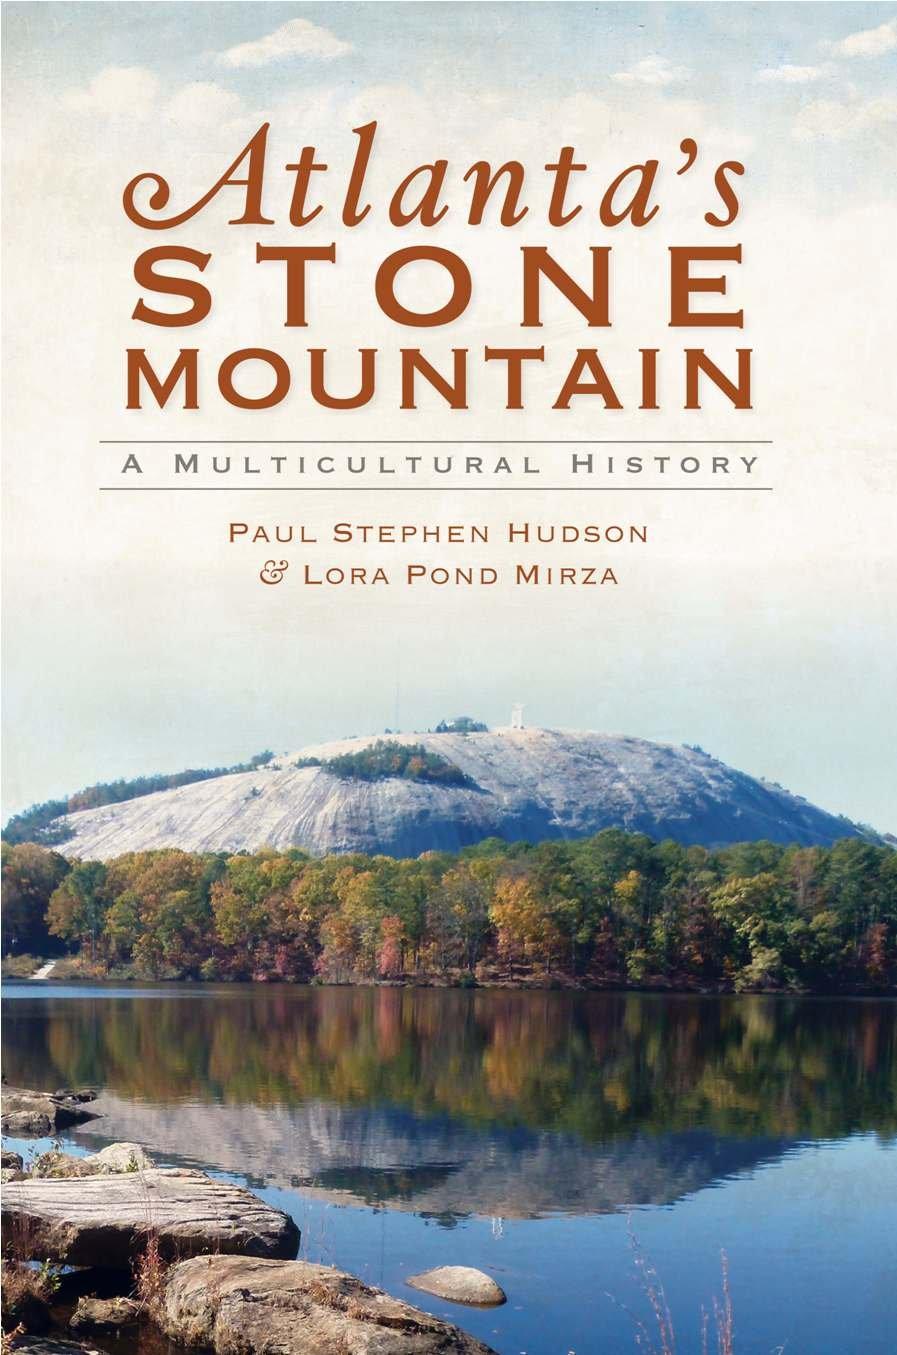 Atlanta's Stone Mountain: A Multicultural History (Brief History)